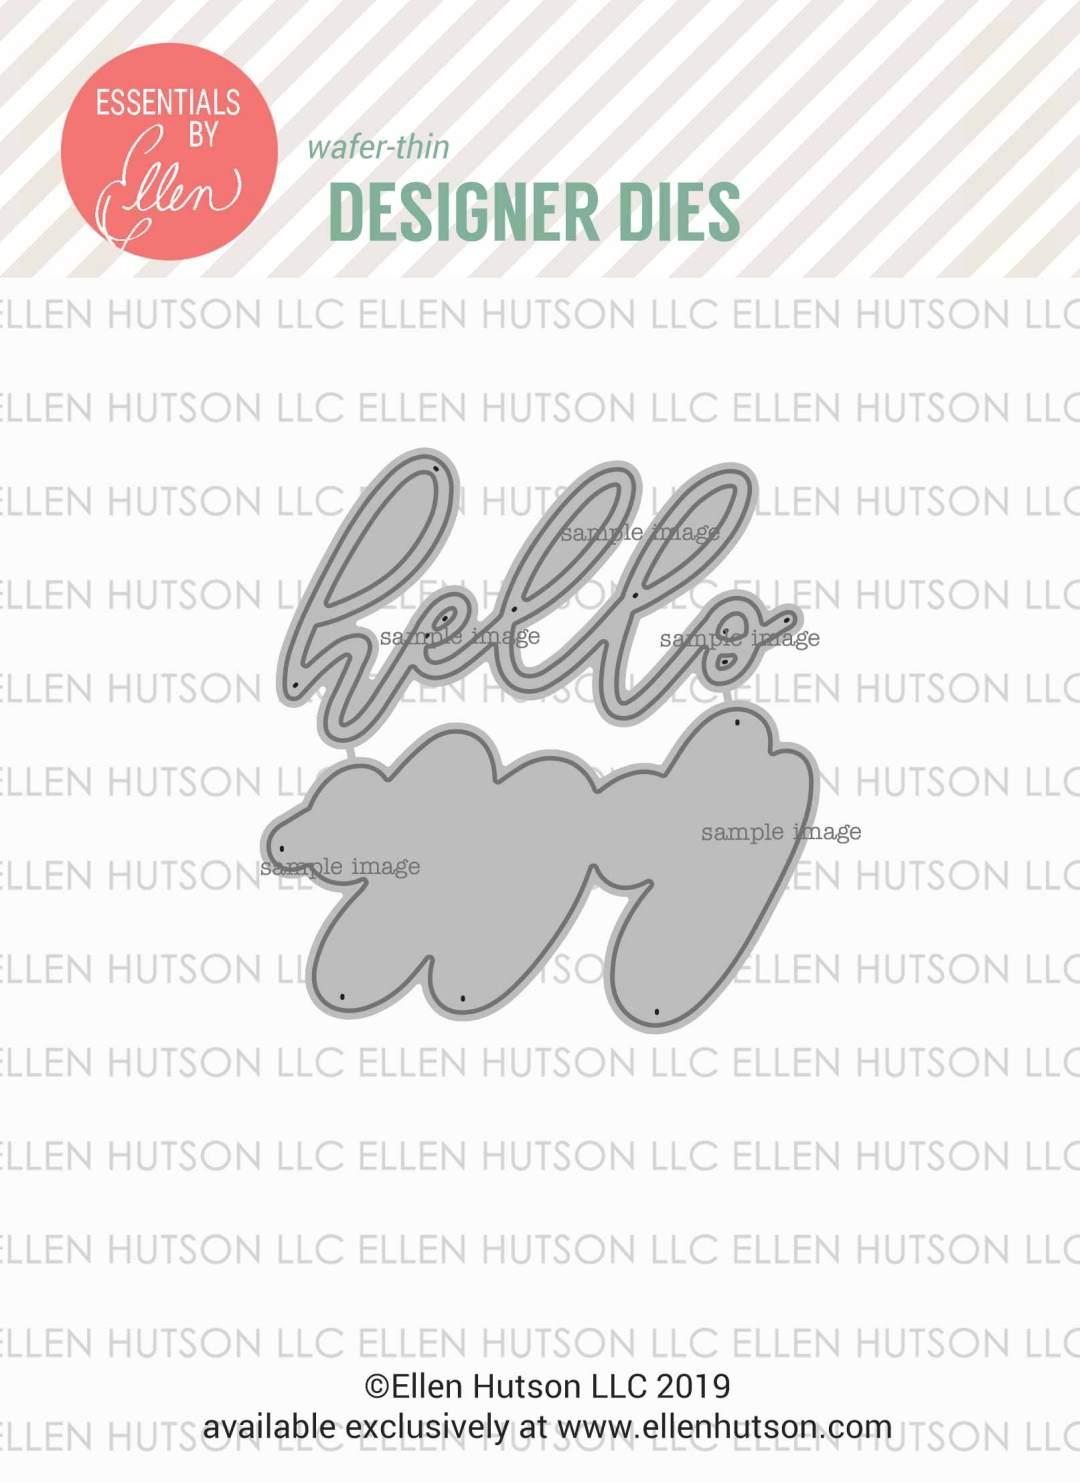 Essentials by Ellen Big Scripty Hello